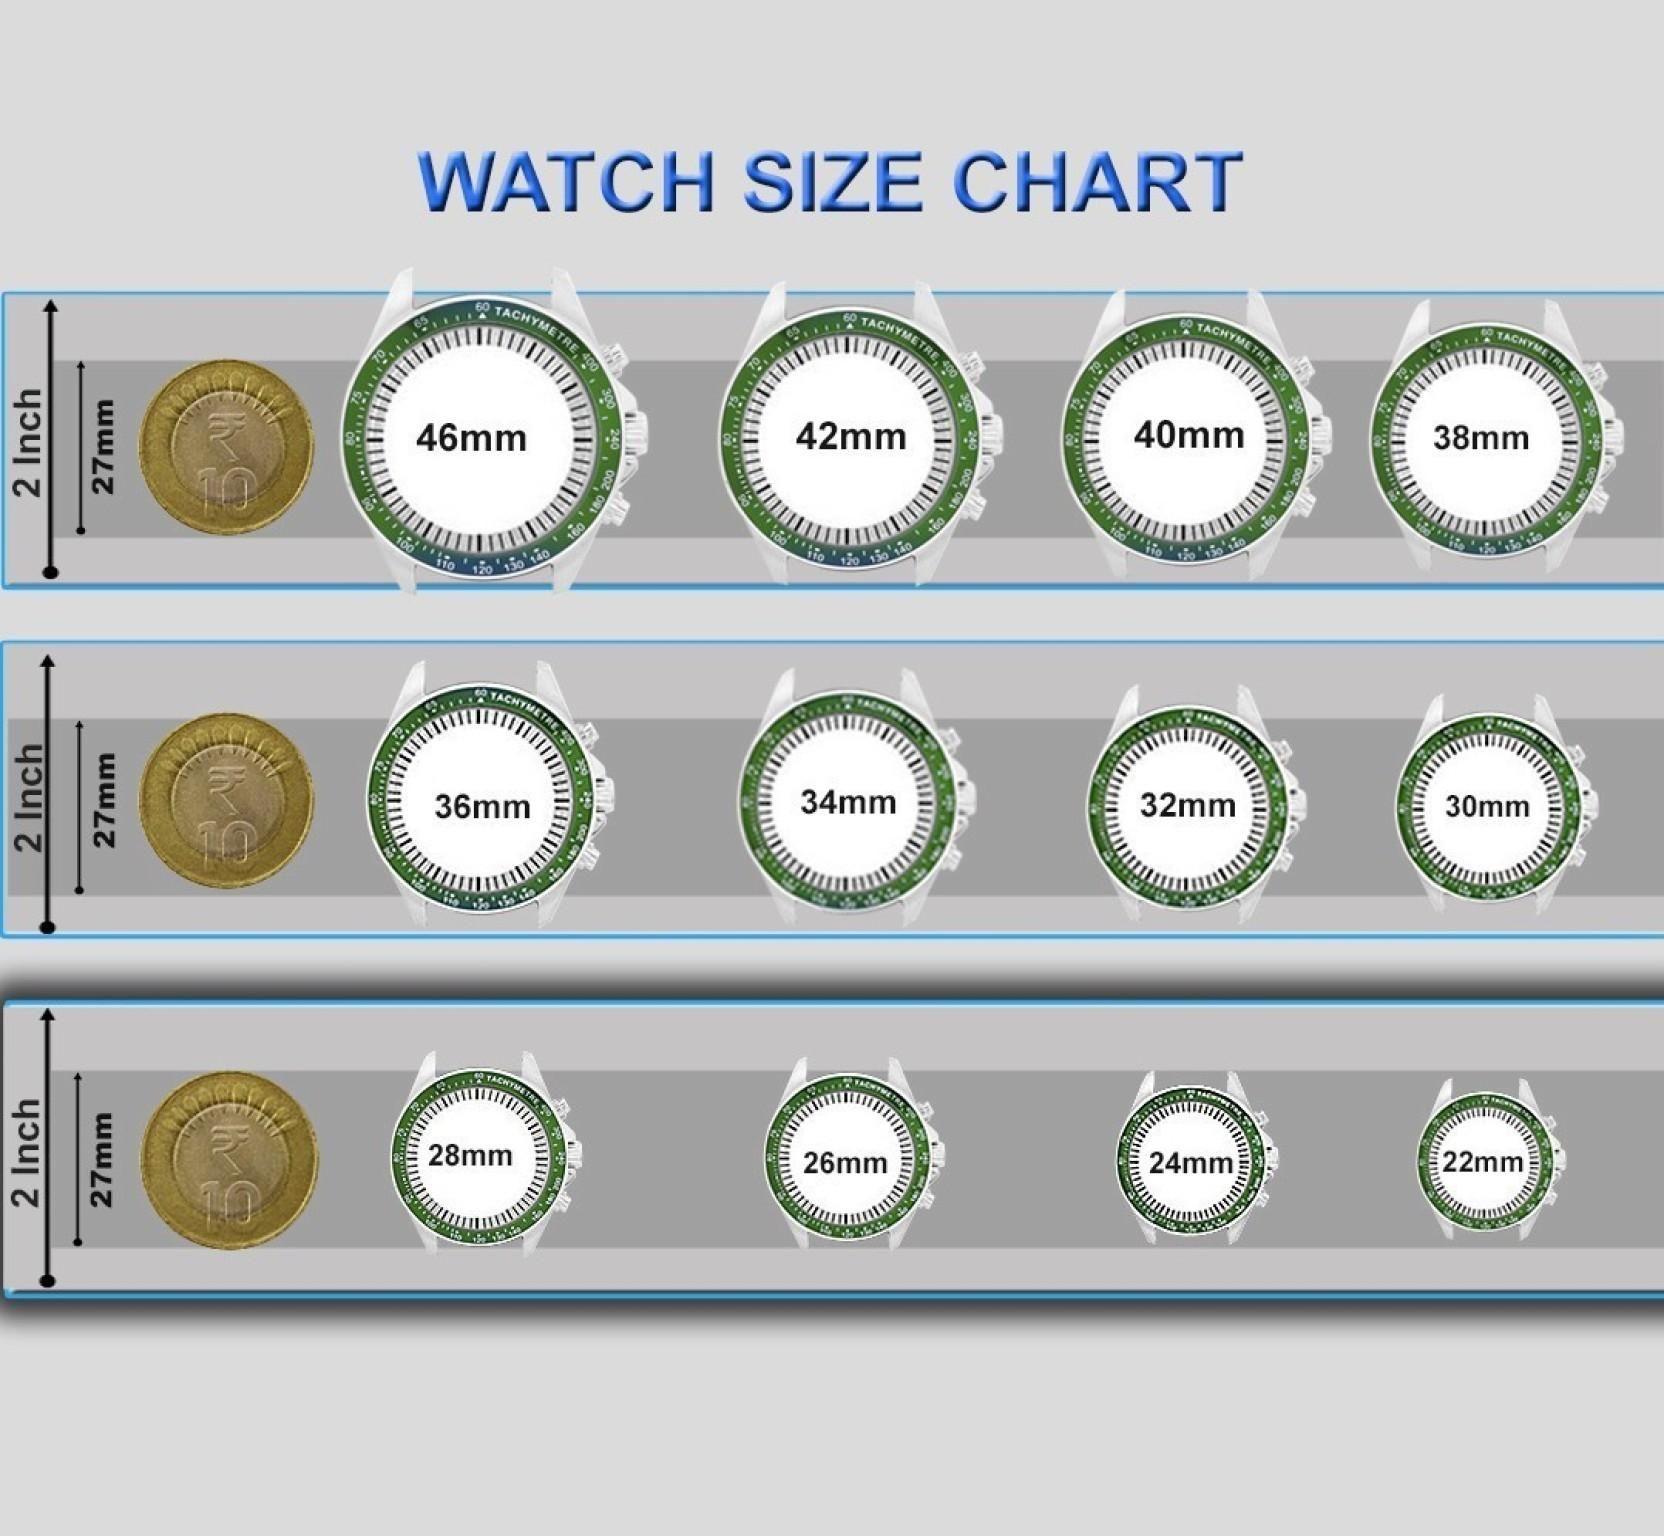 Camerii CWL780 Watch - For Women